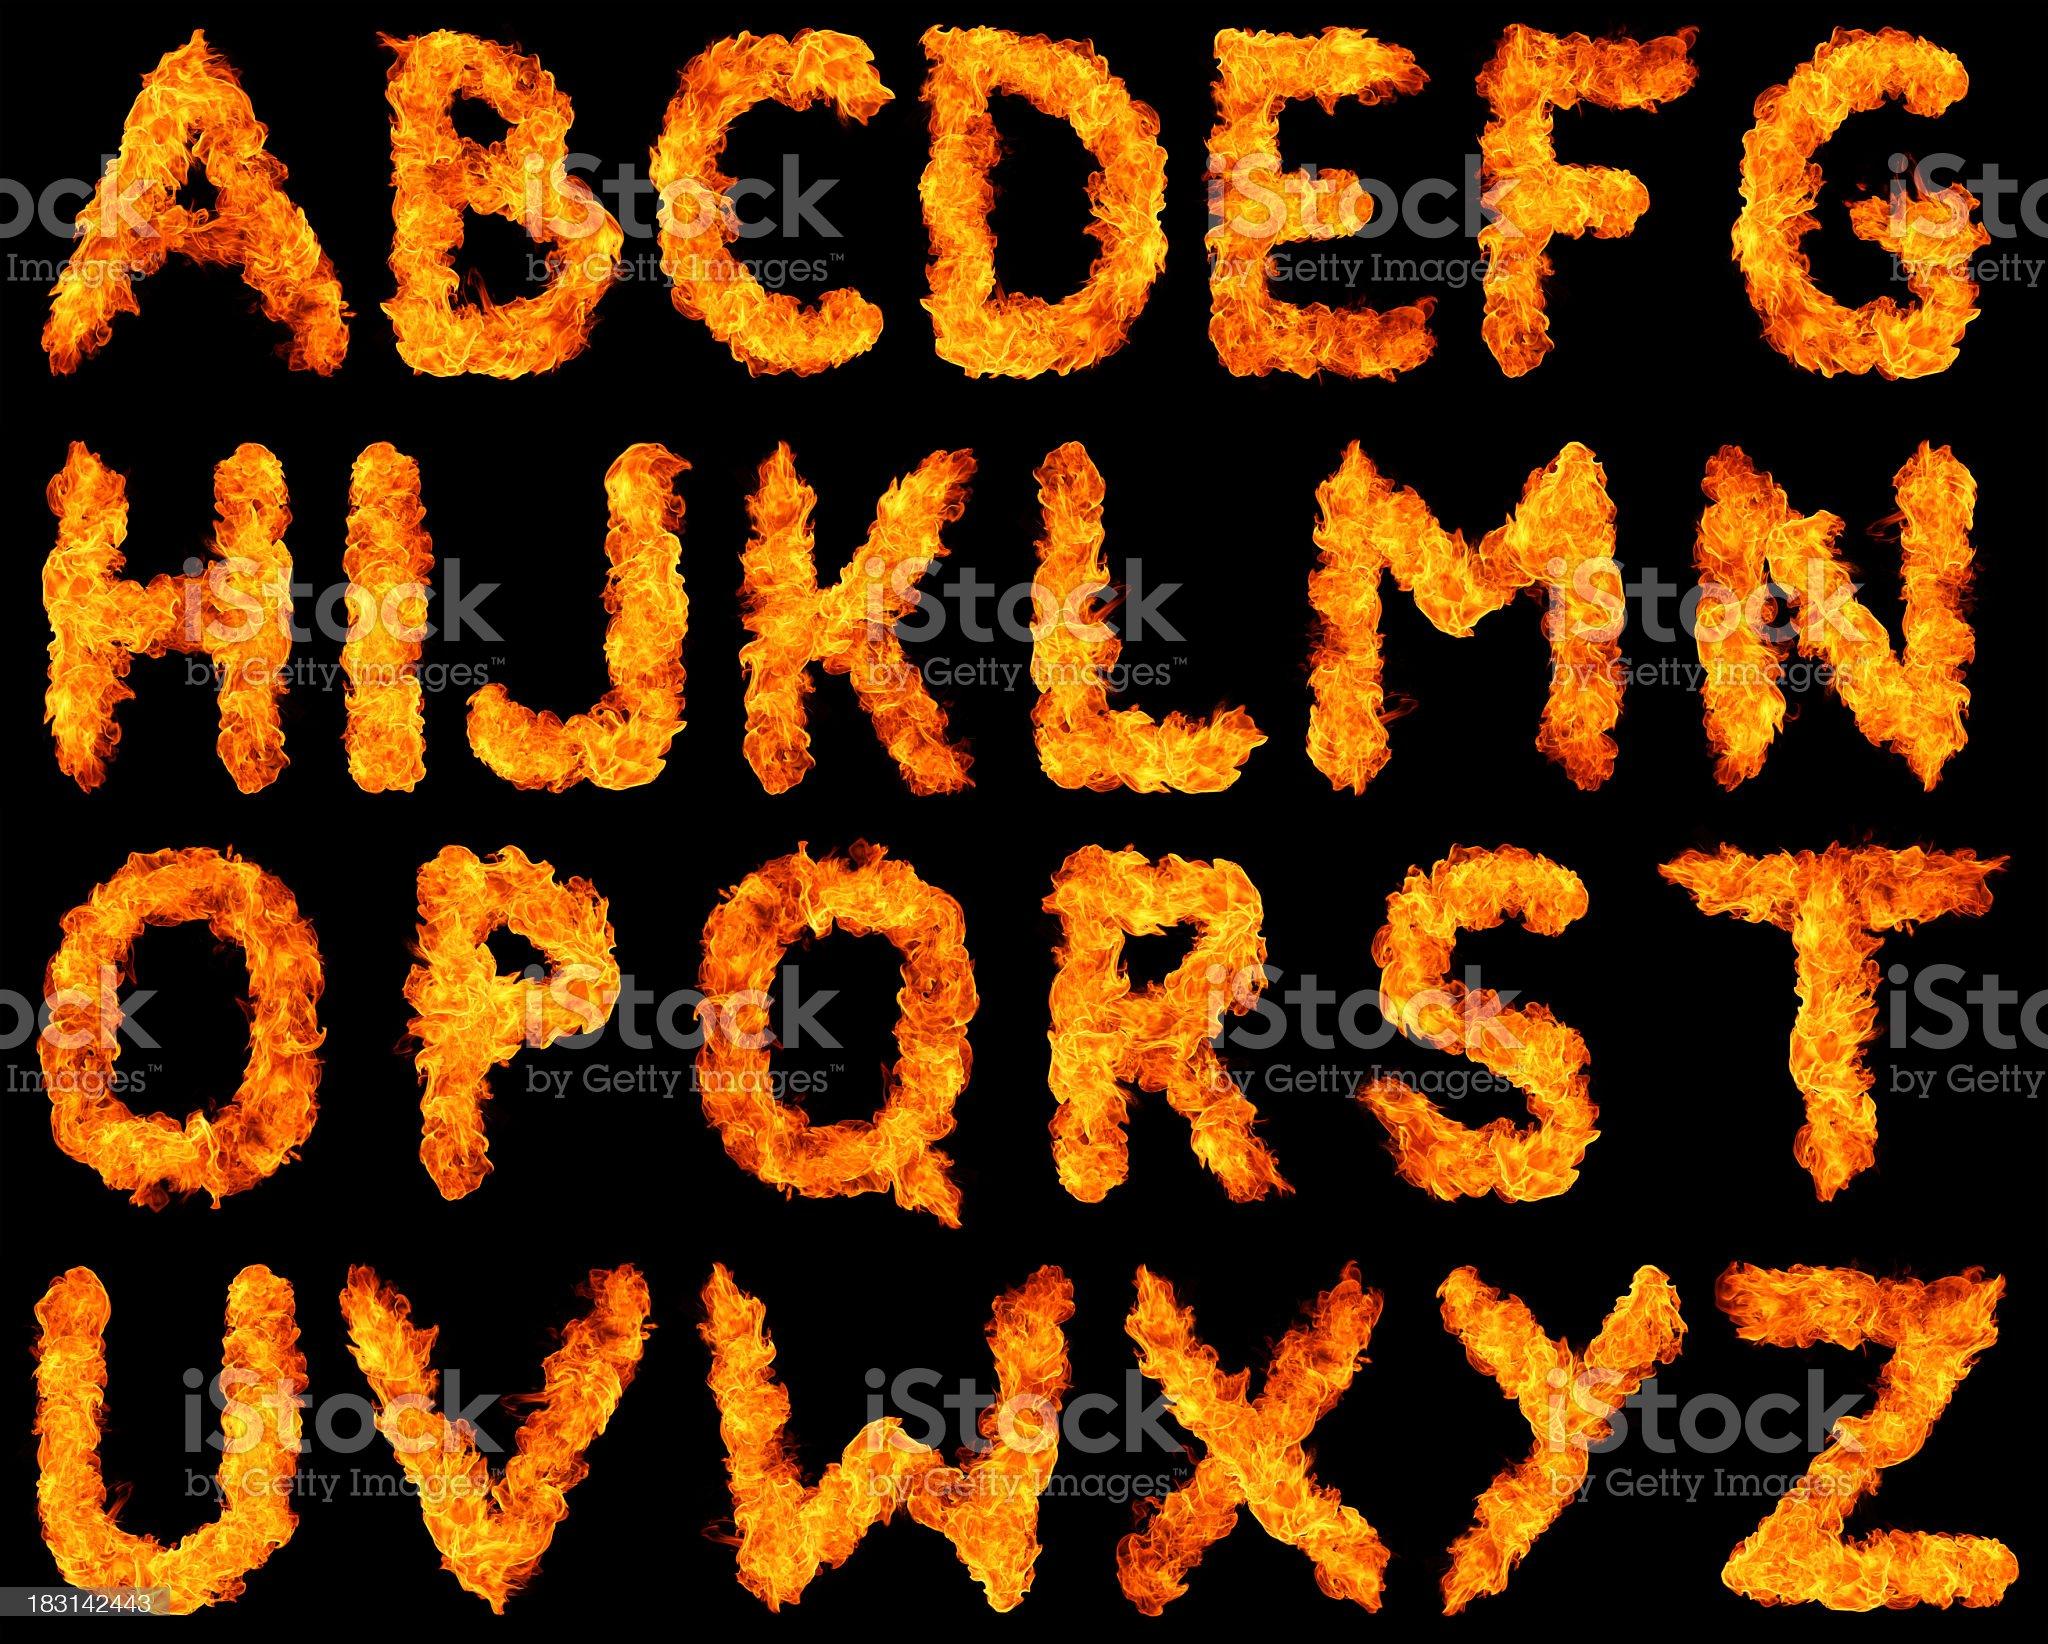 Burning alphabet XXXL royalty-free stock photo